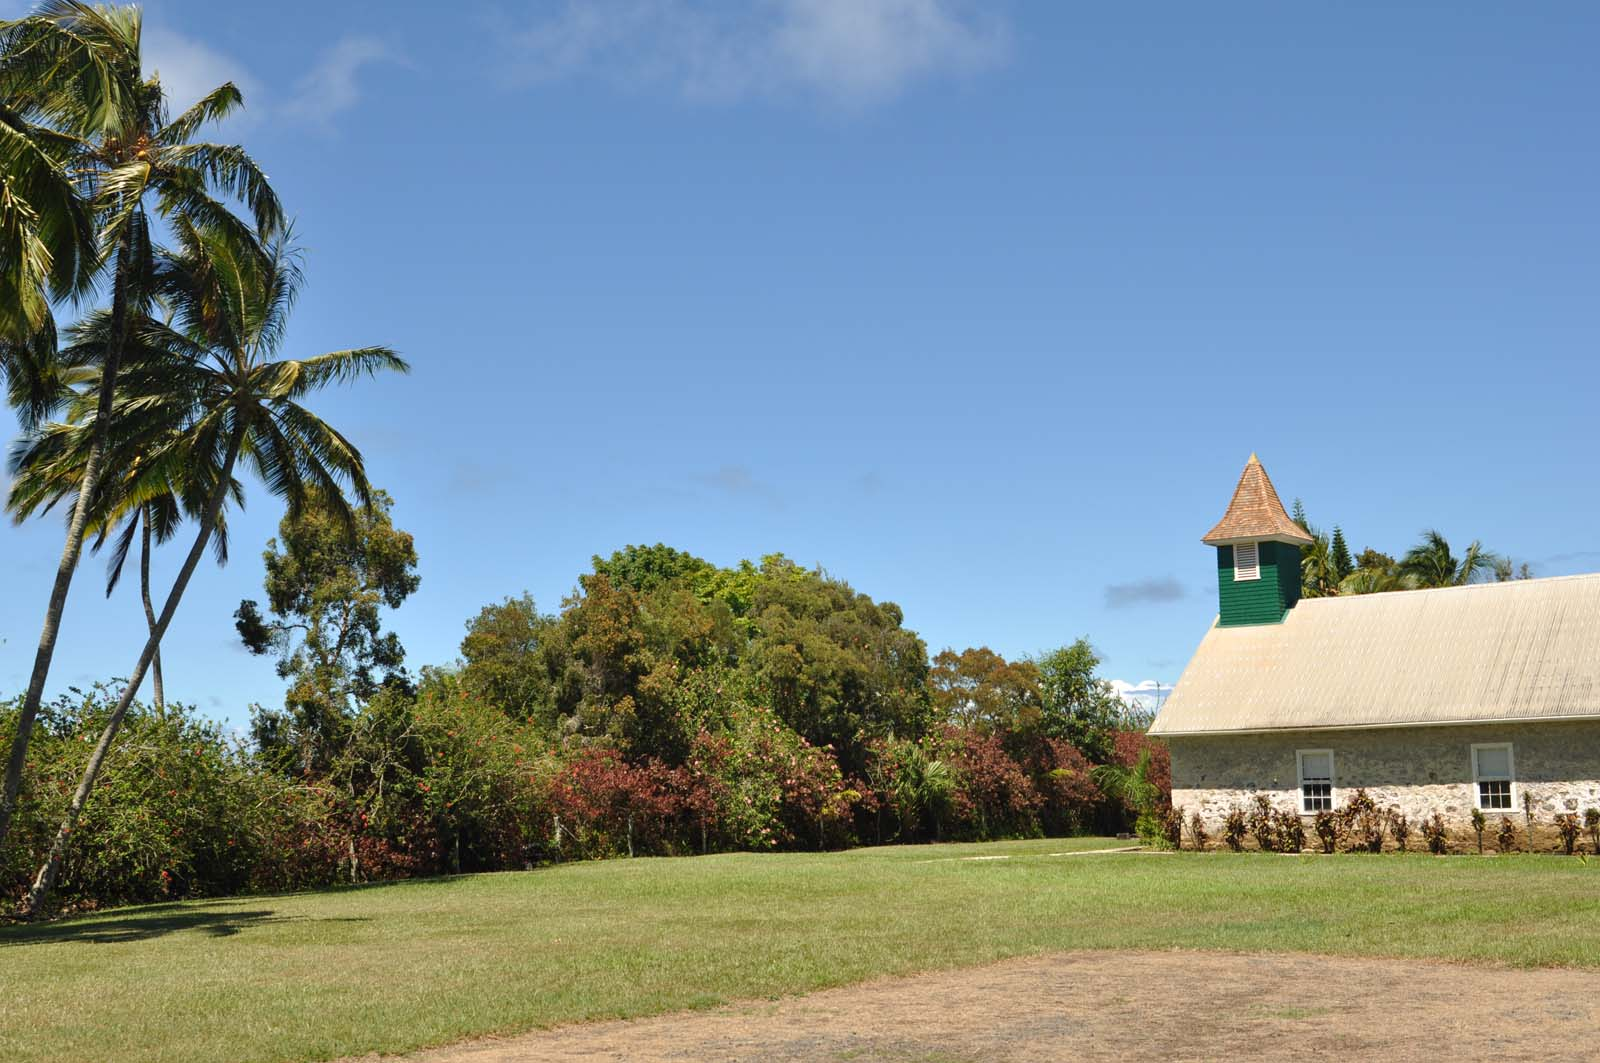 043_maui_hawaii_island